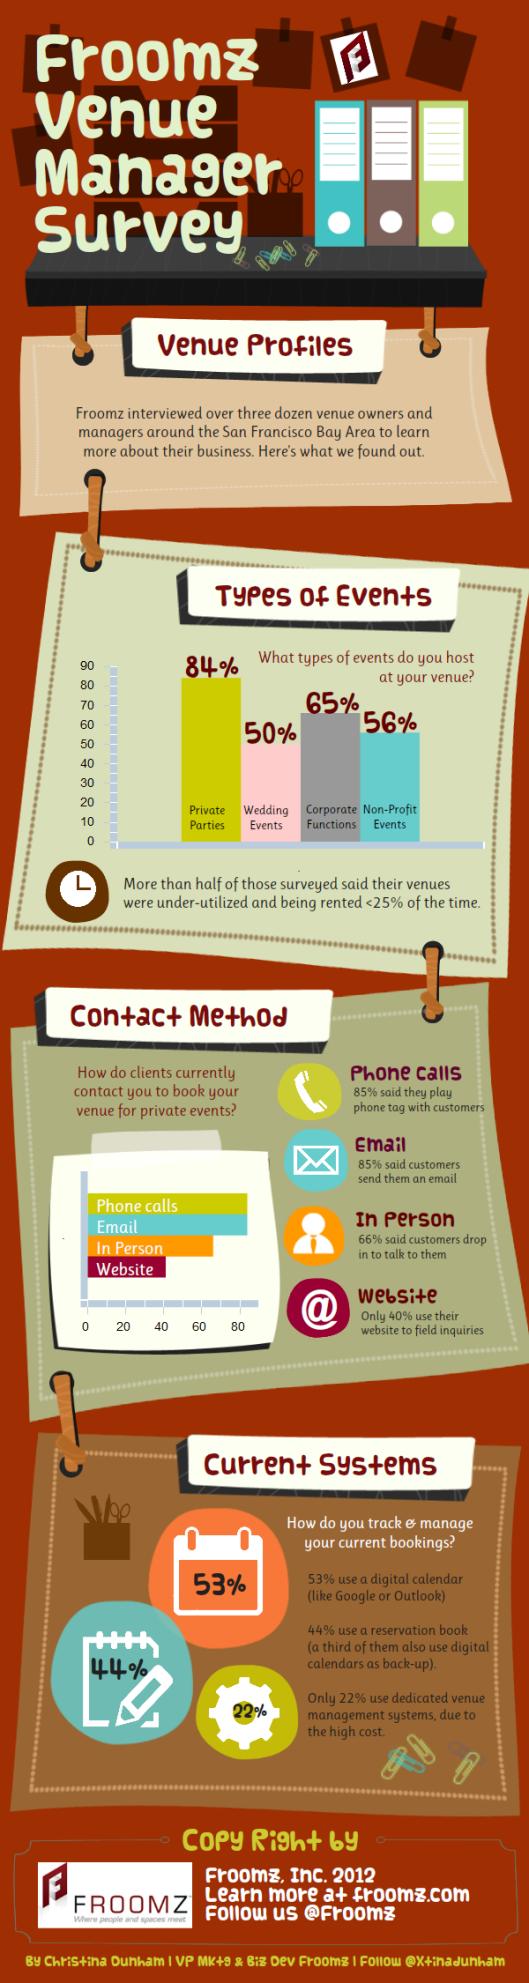 Venue Manager Survey Froomz